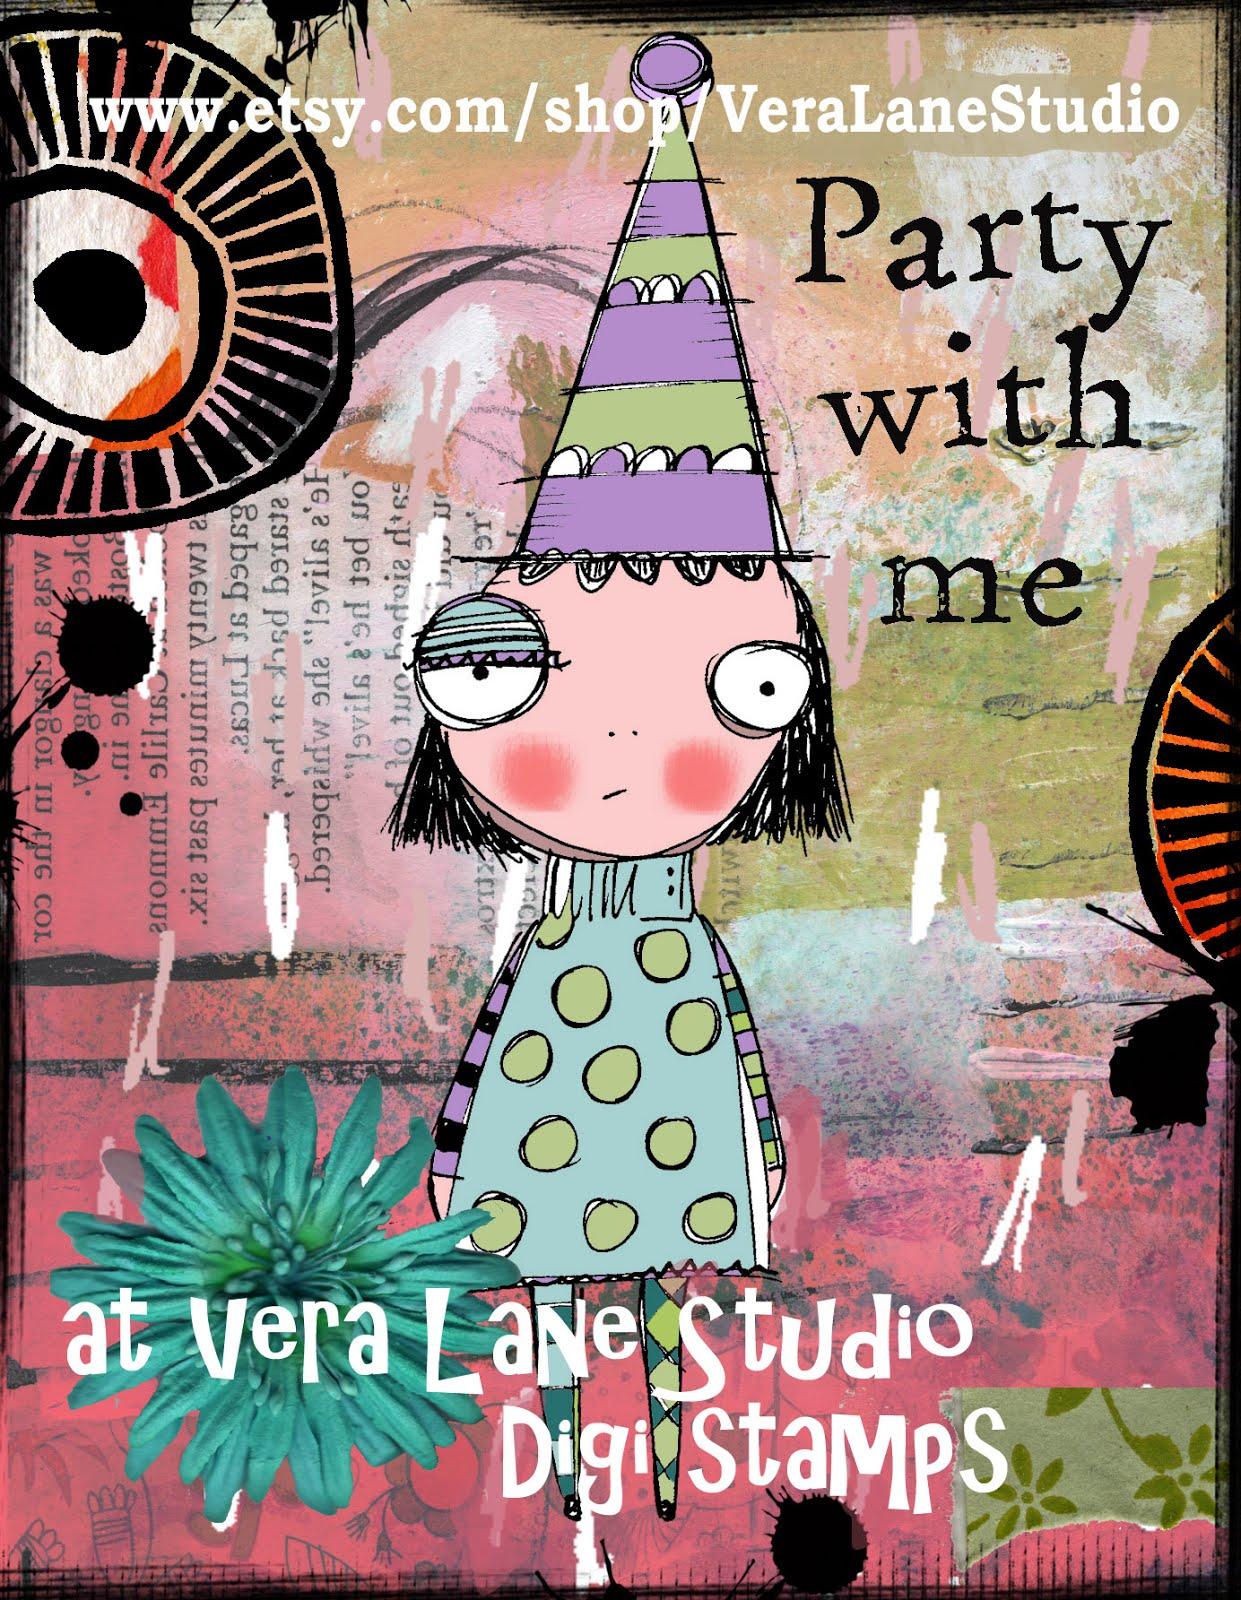 Vera Lane Studios